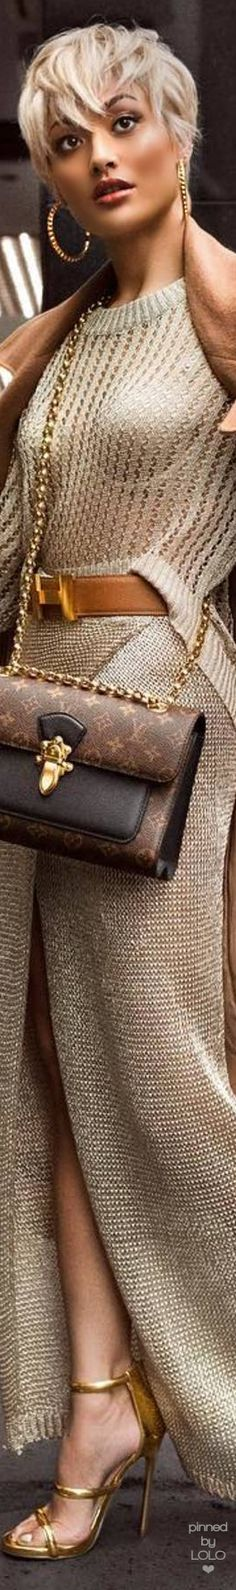 Micah Gianneli Street Chic Louis Vuitton